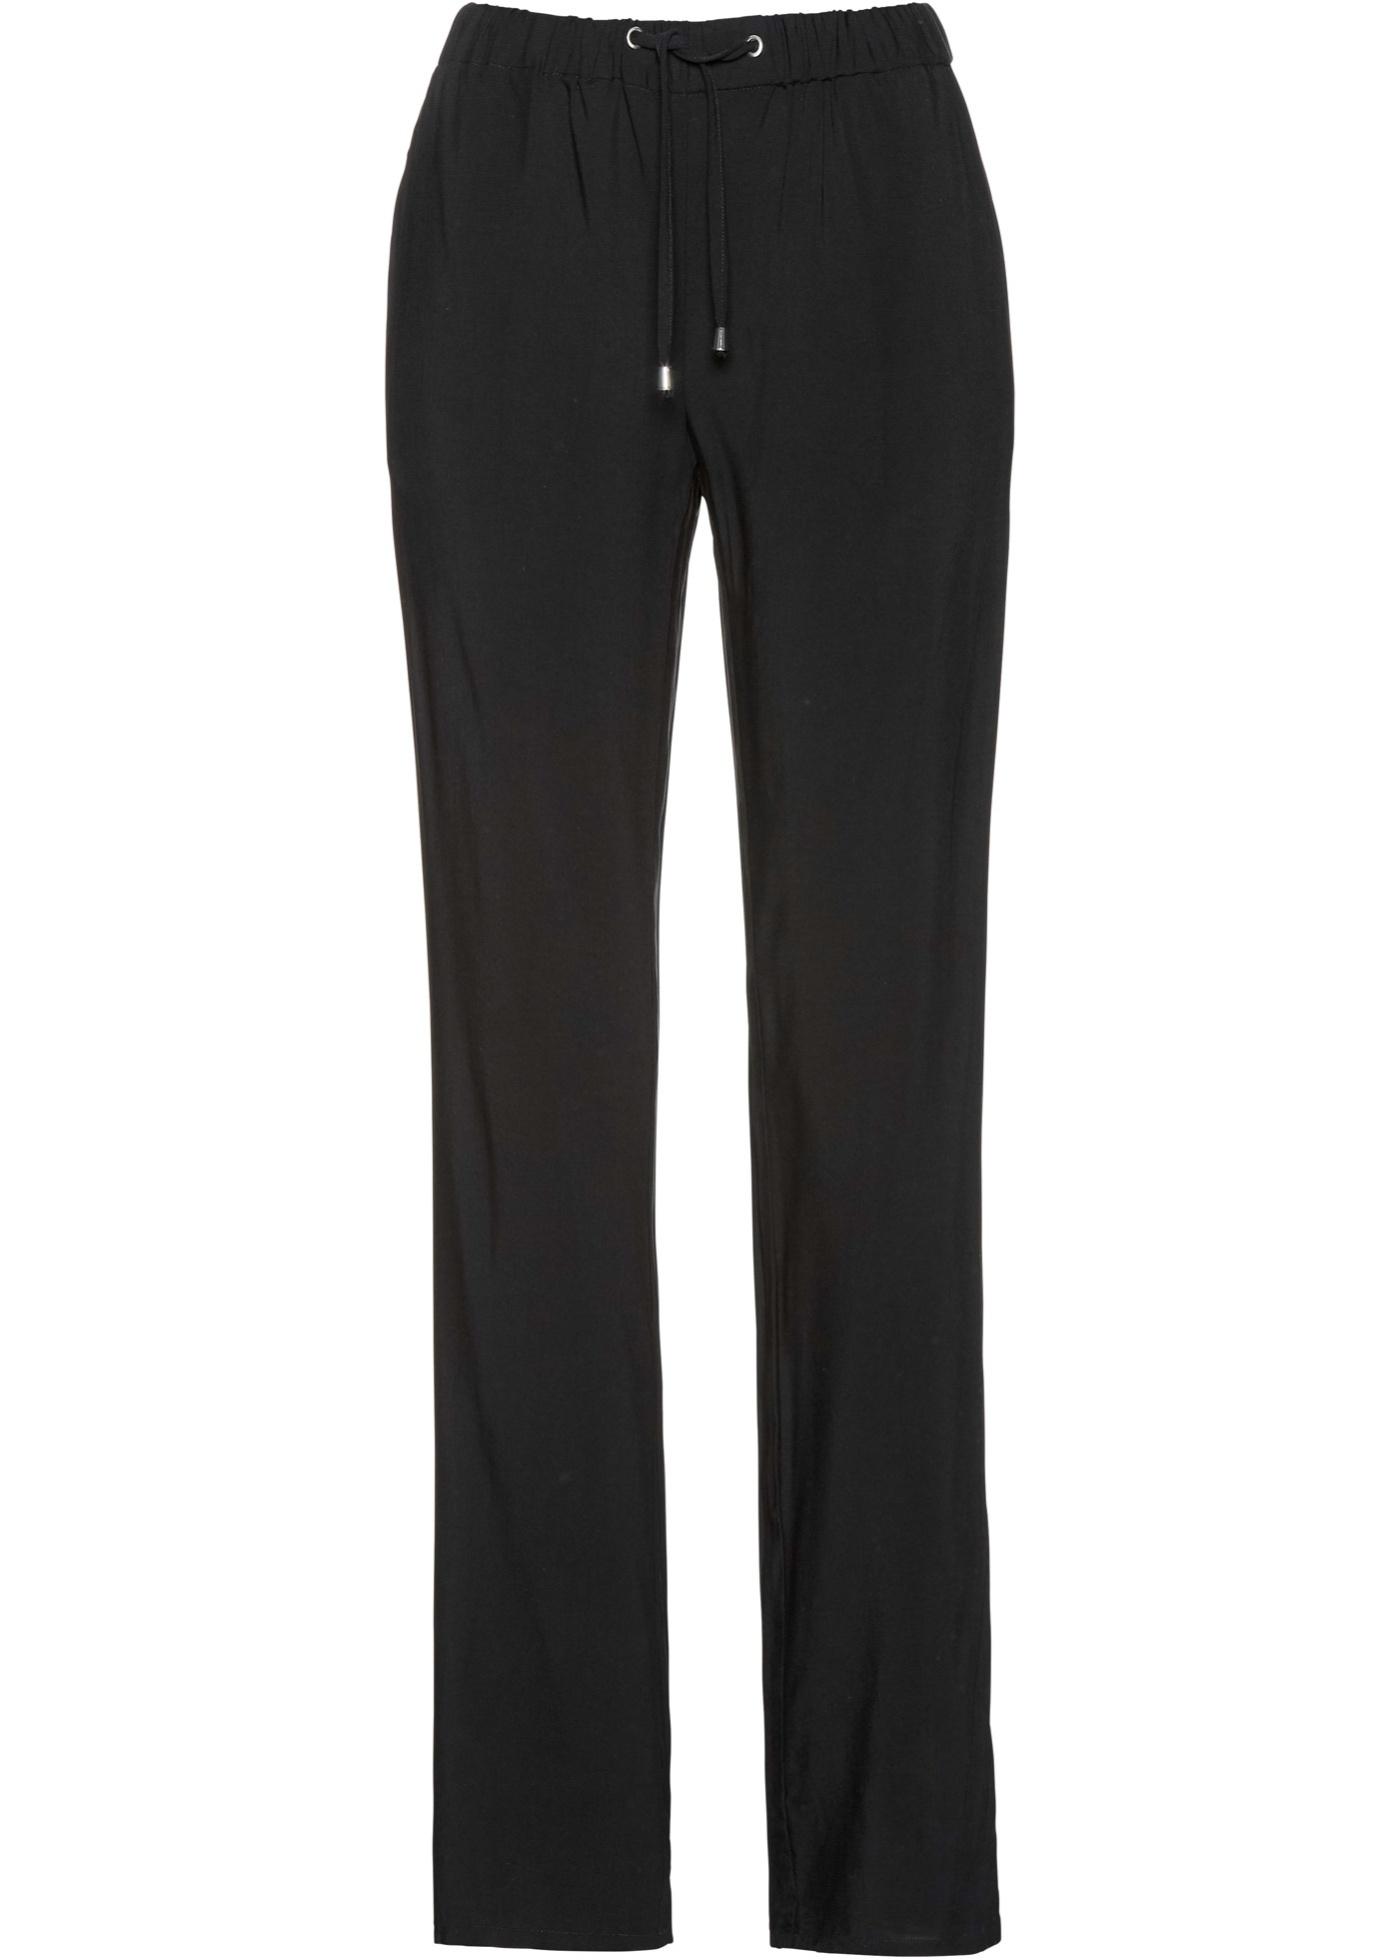 Pantaloni in viscosa fantasia con elastico (Nero) - bpc selection